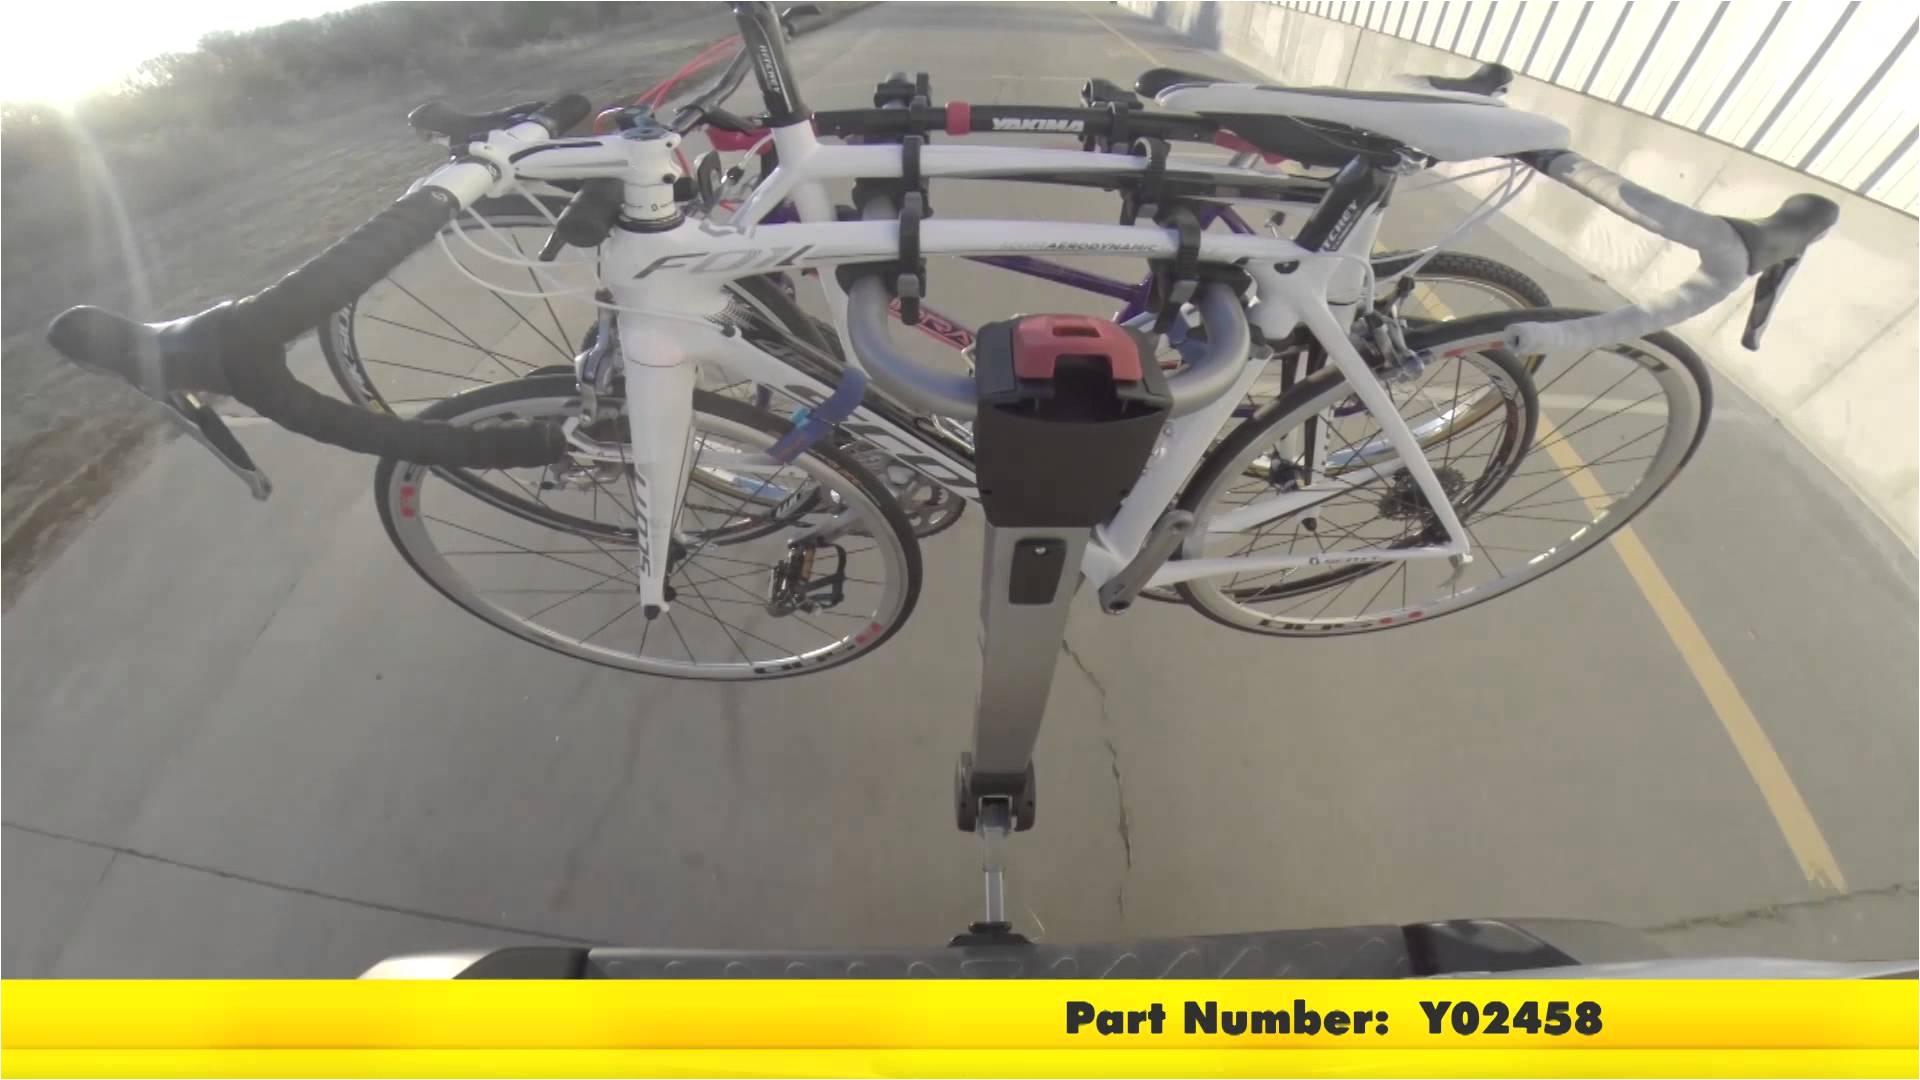 Yakima Ridgeback 4 Bike Hitch Mounted Bicycle Rack Review Of the Yakima Ridgeback 4 Bike Rack On A 2014 toyota Sienna